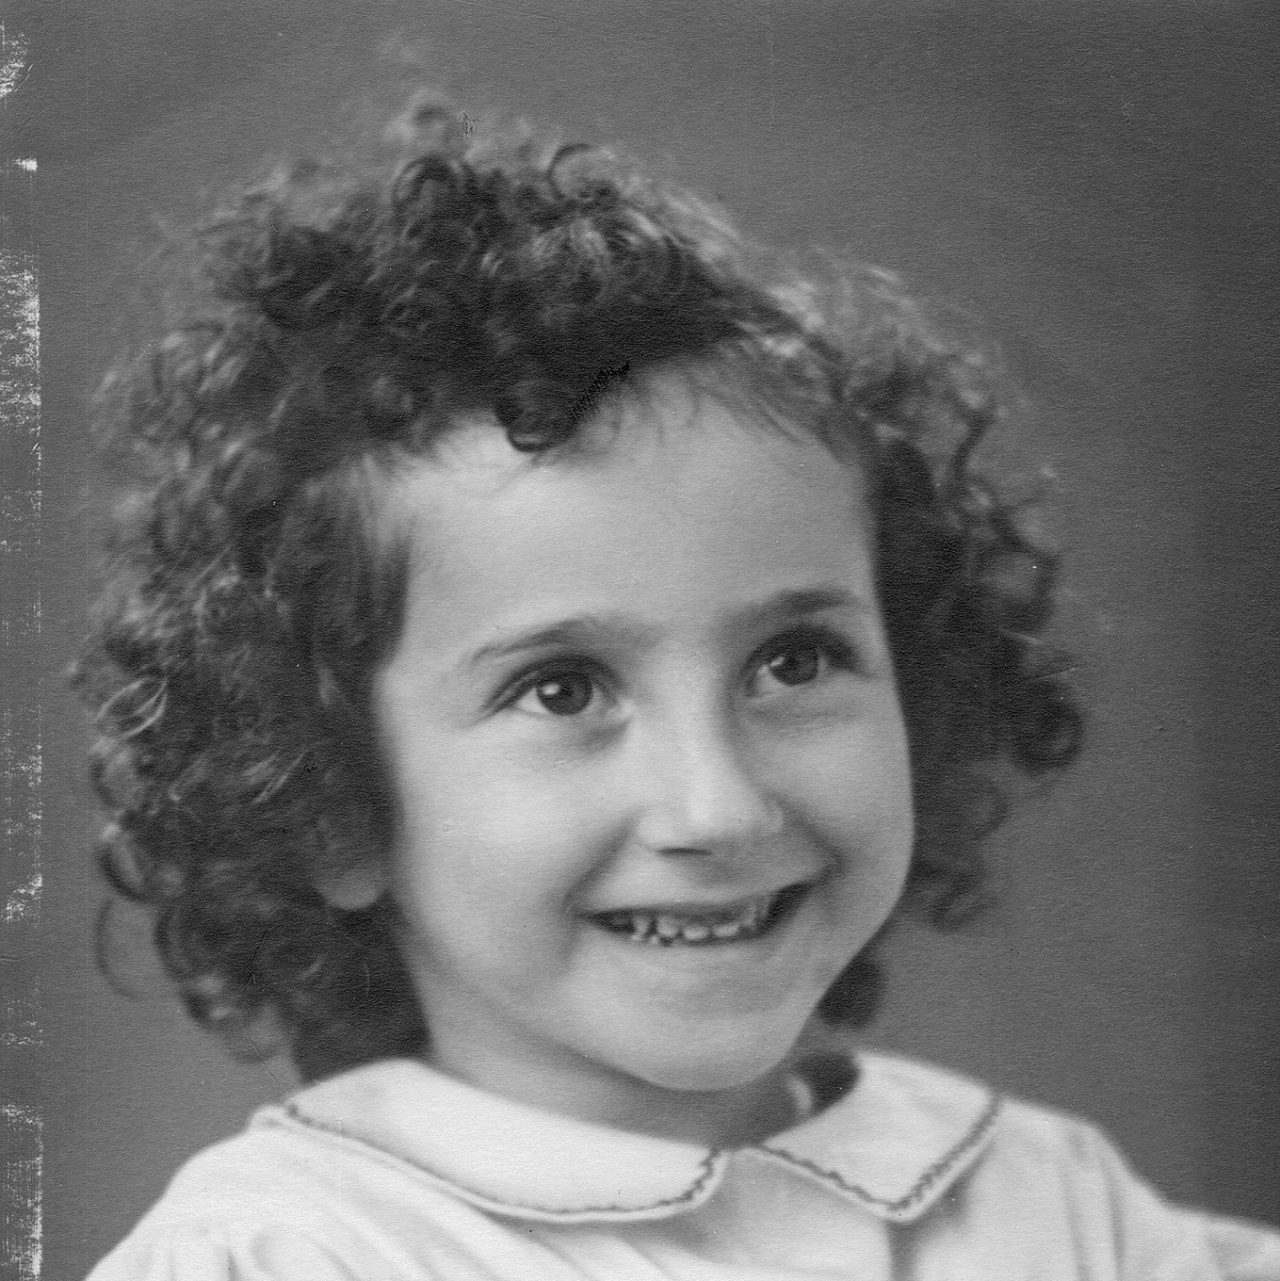 Blanche Benedick